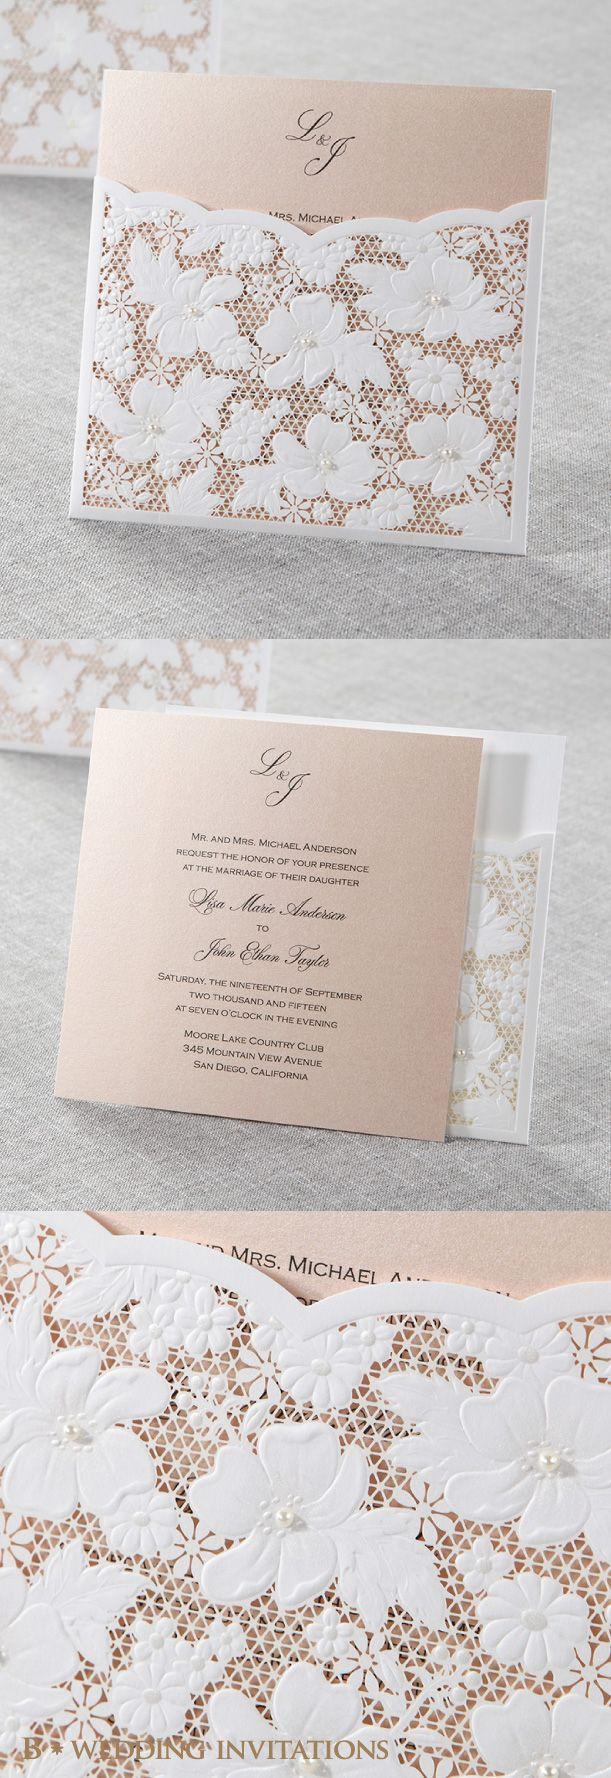 laser cut wedding invites canada%0A Spring Flower Pocket by B Wedding Invitations  wedding  invitations   weddinginvitations  lasercut